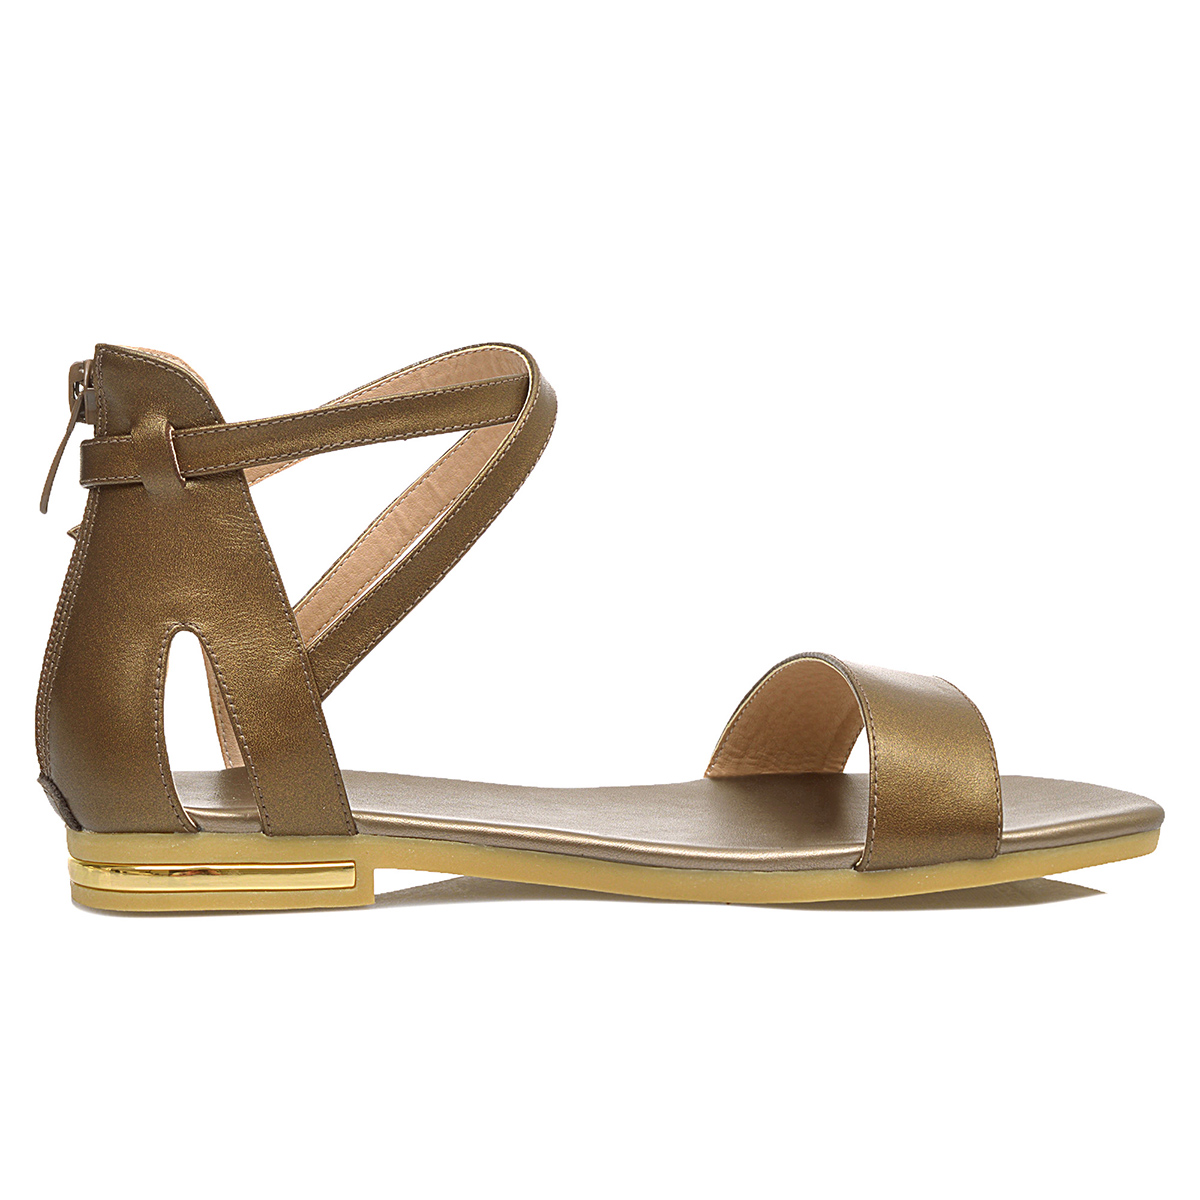 Tamaño 34 Negro Genuino Señoras Mujeres Zapatos Verano Blanco Cuero Nnw08m